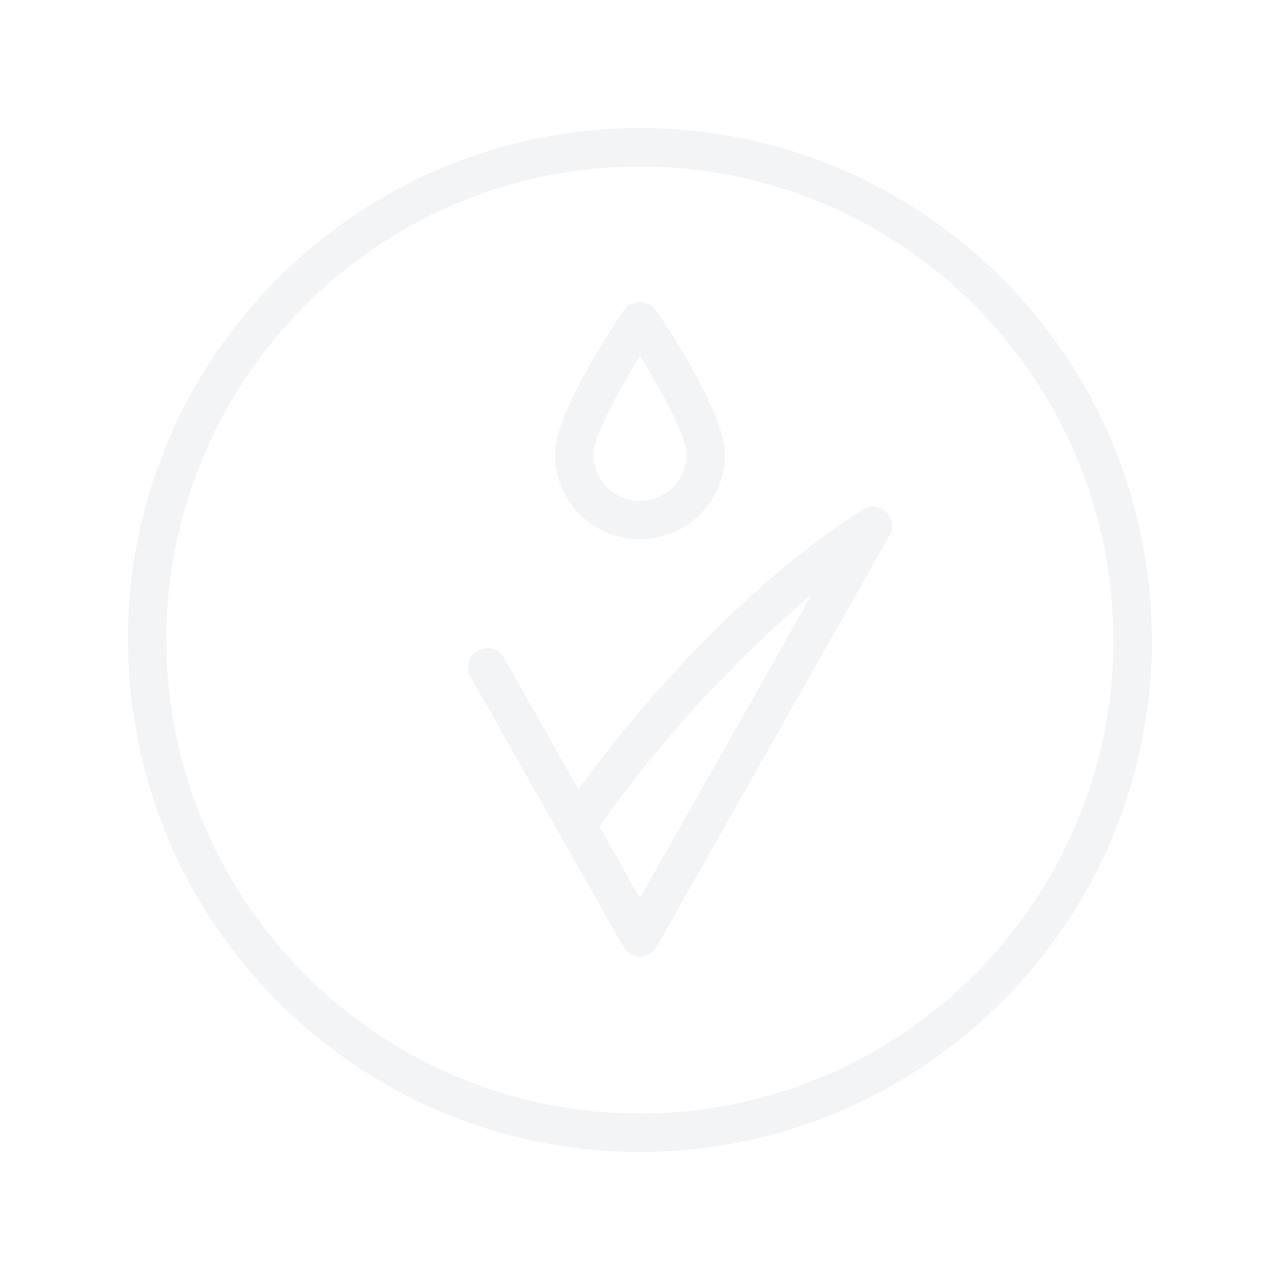 E.L.F. Flawless Face Powder 5g